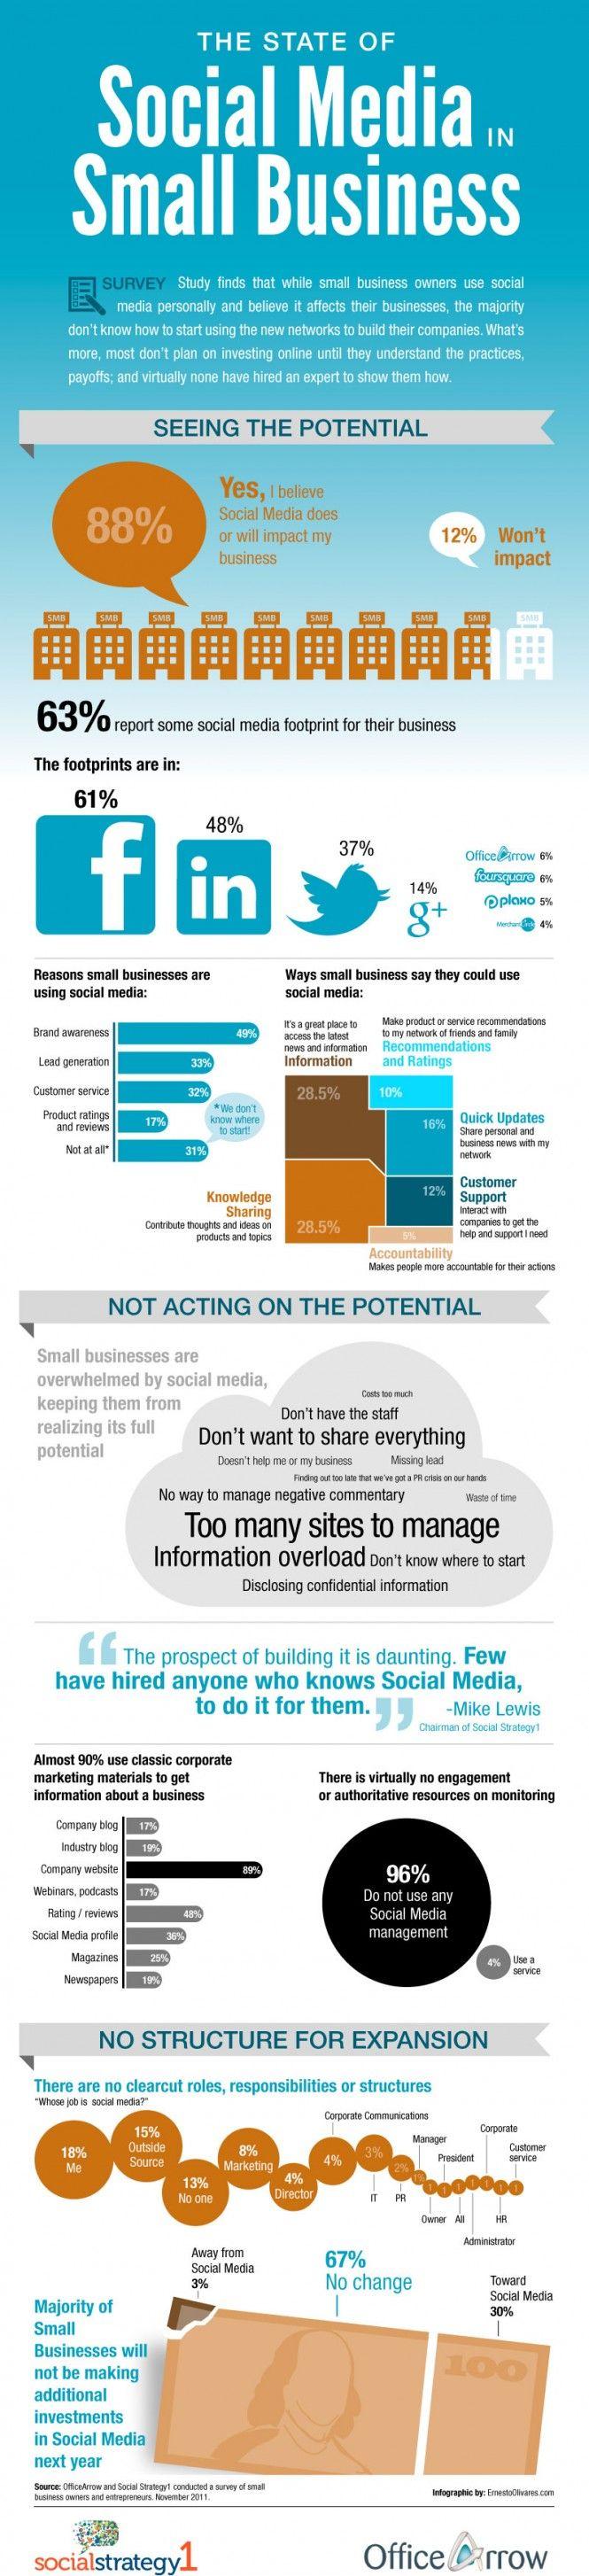 social media in small business